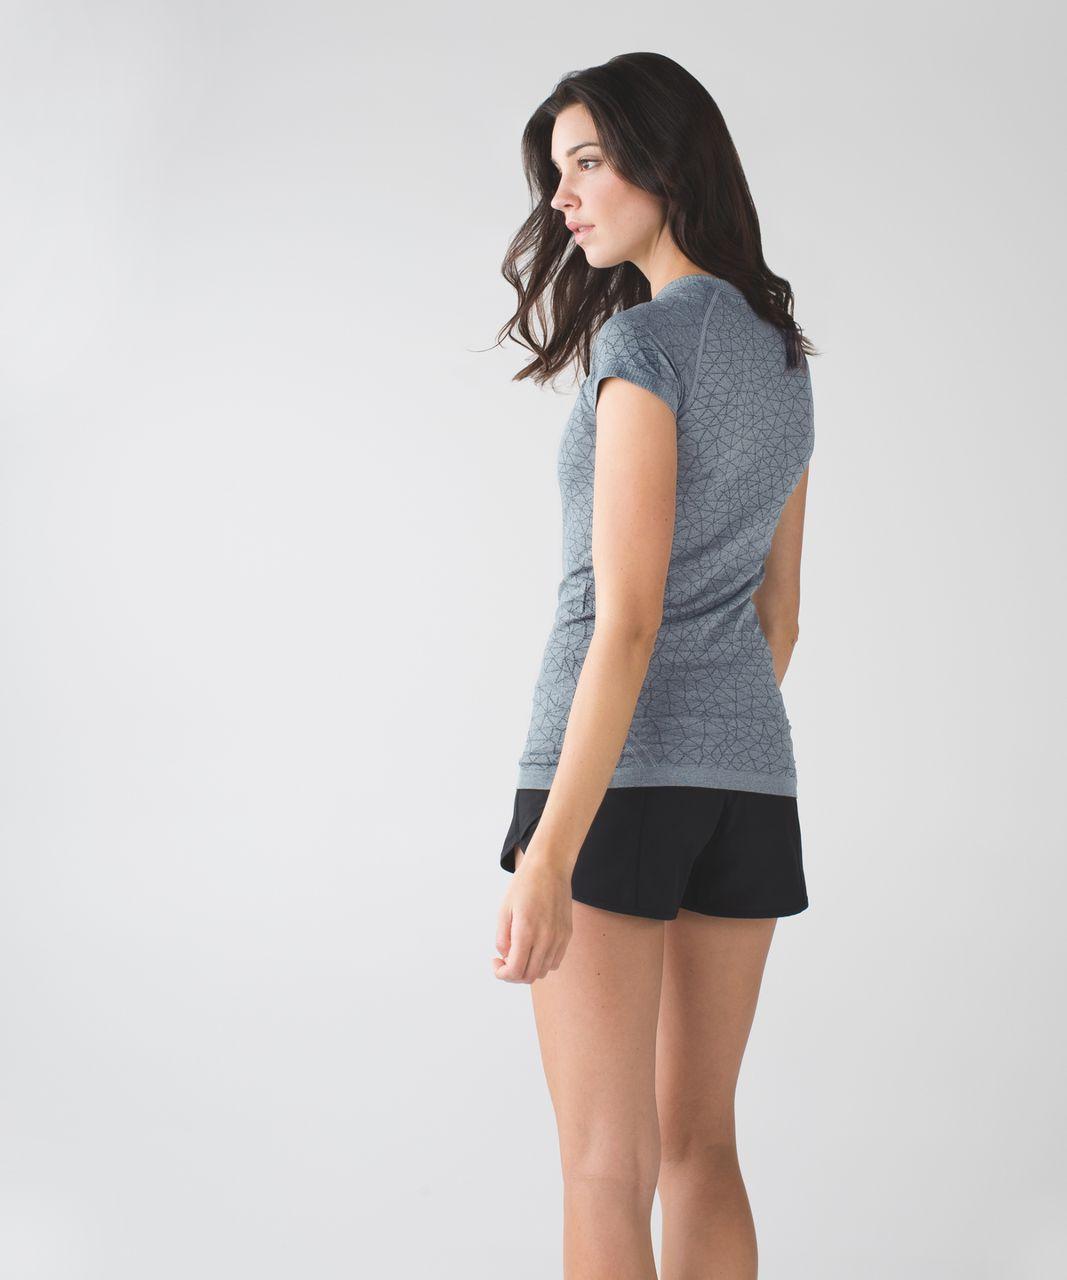 Lululemon Swiftly Tech Short Sleeve Crew - Heathered Slate